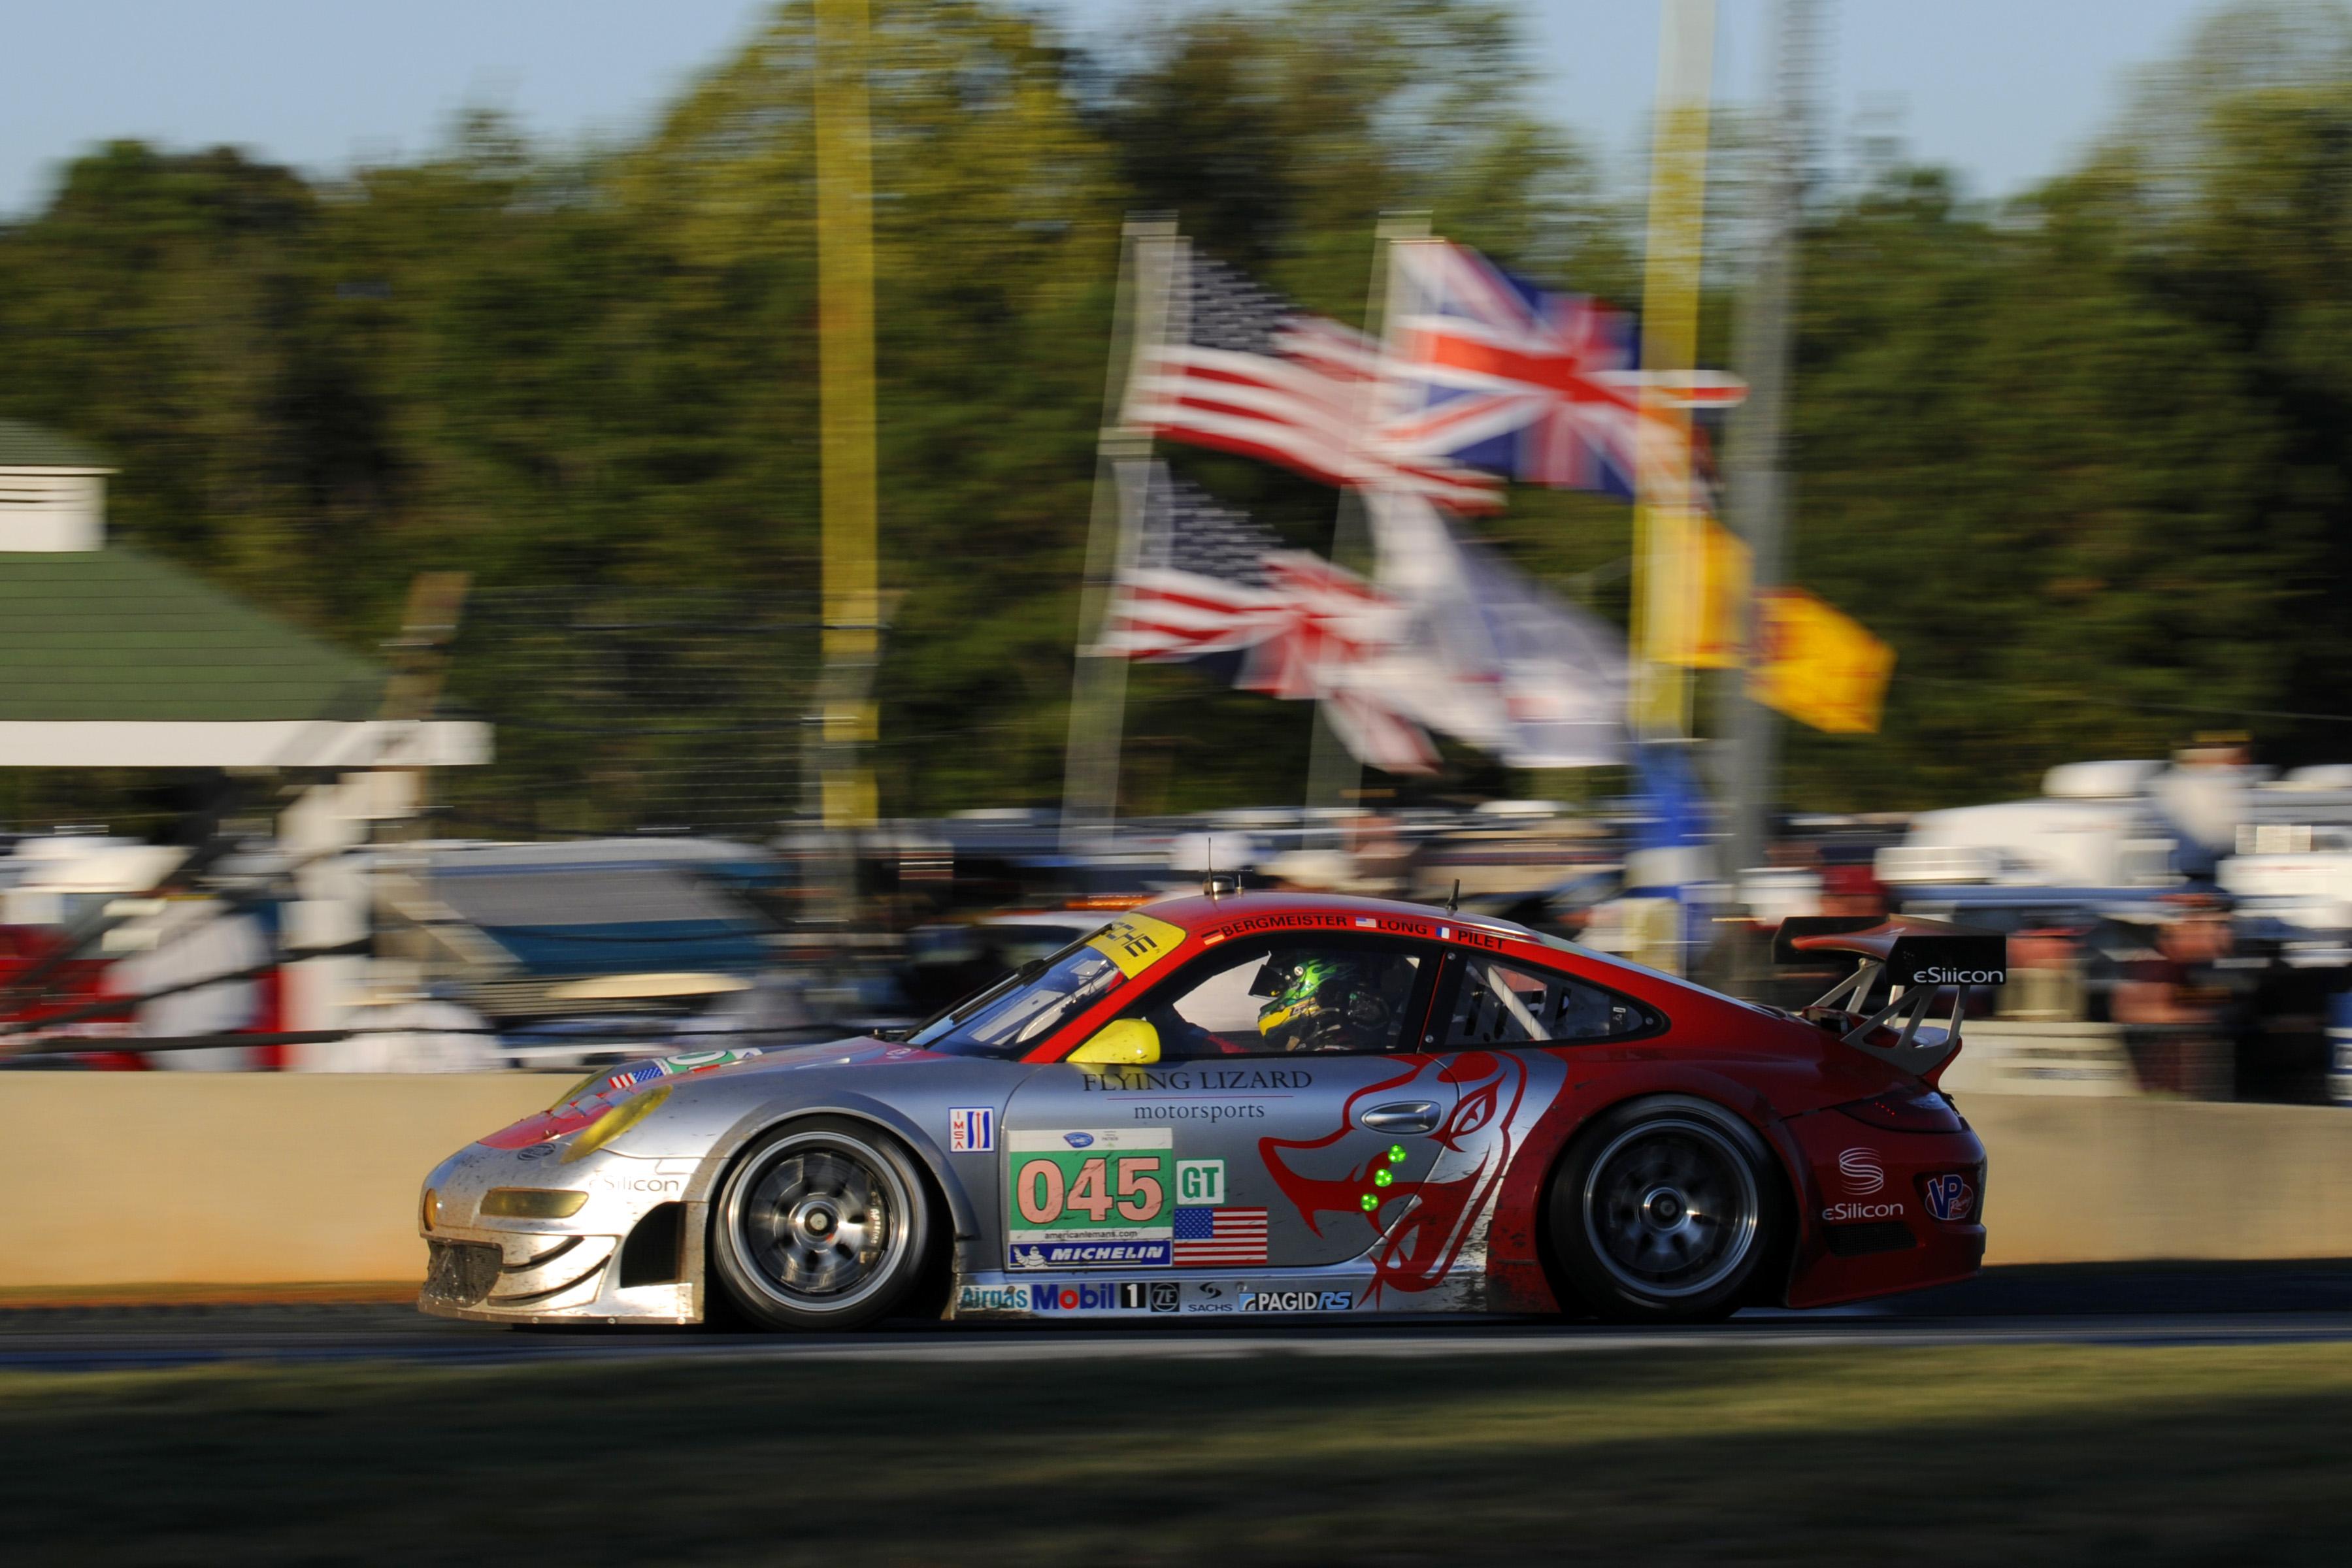 m11_4150_fine Inspiring Porsche 911 Gt1 Road atlanta Cars Trend